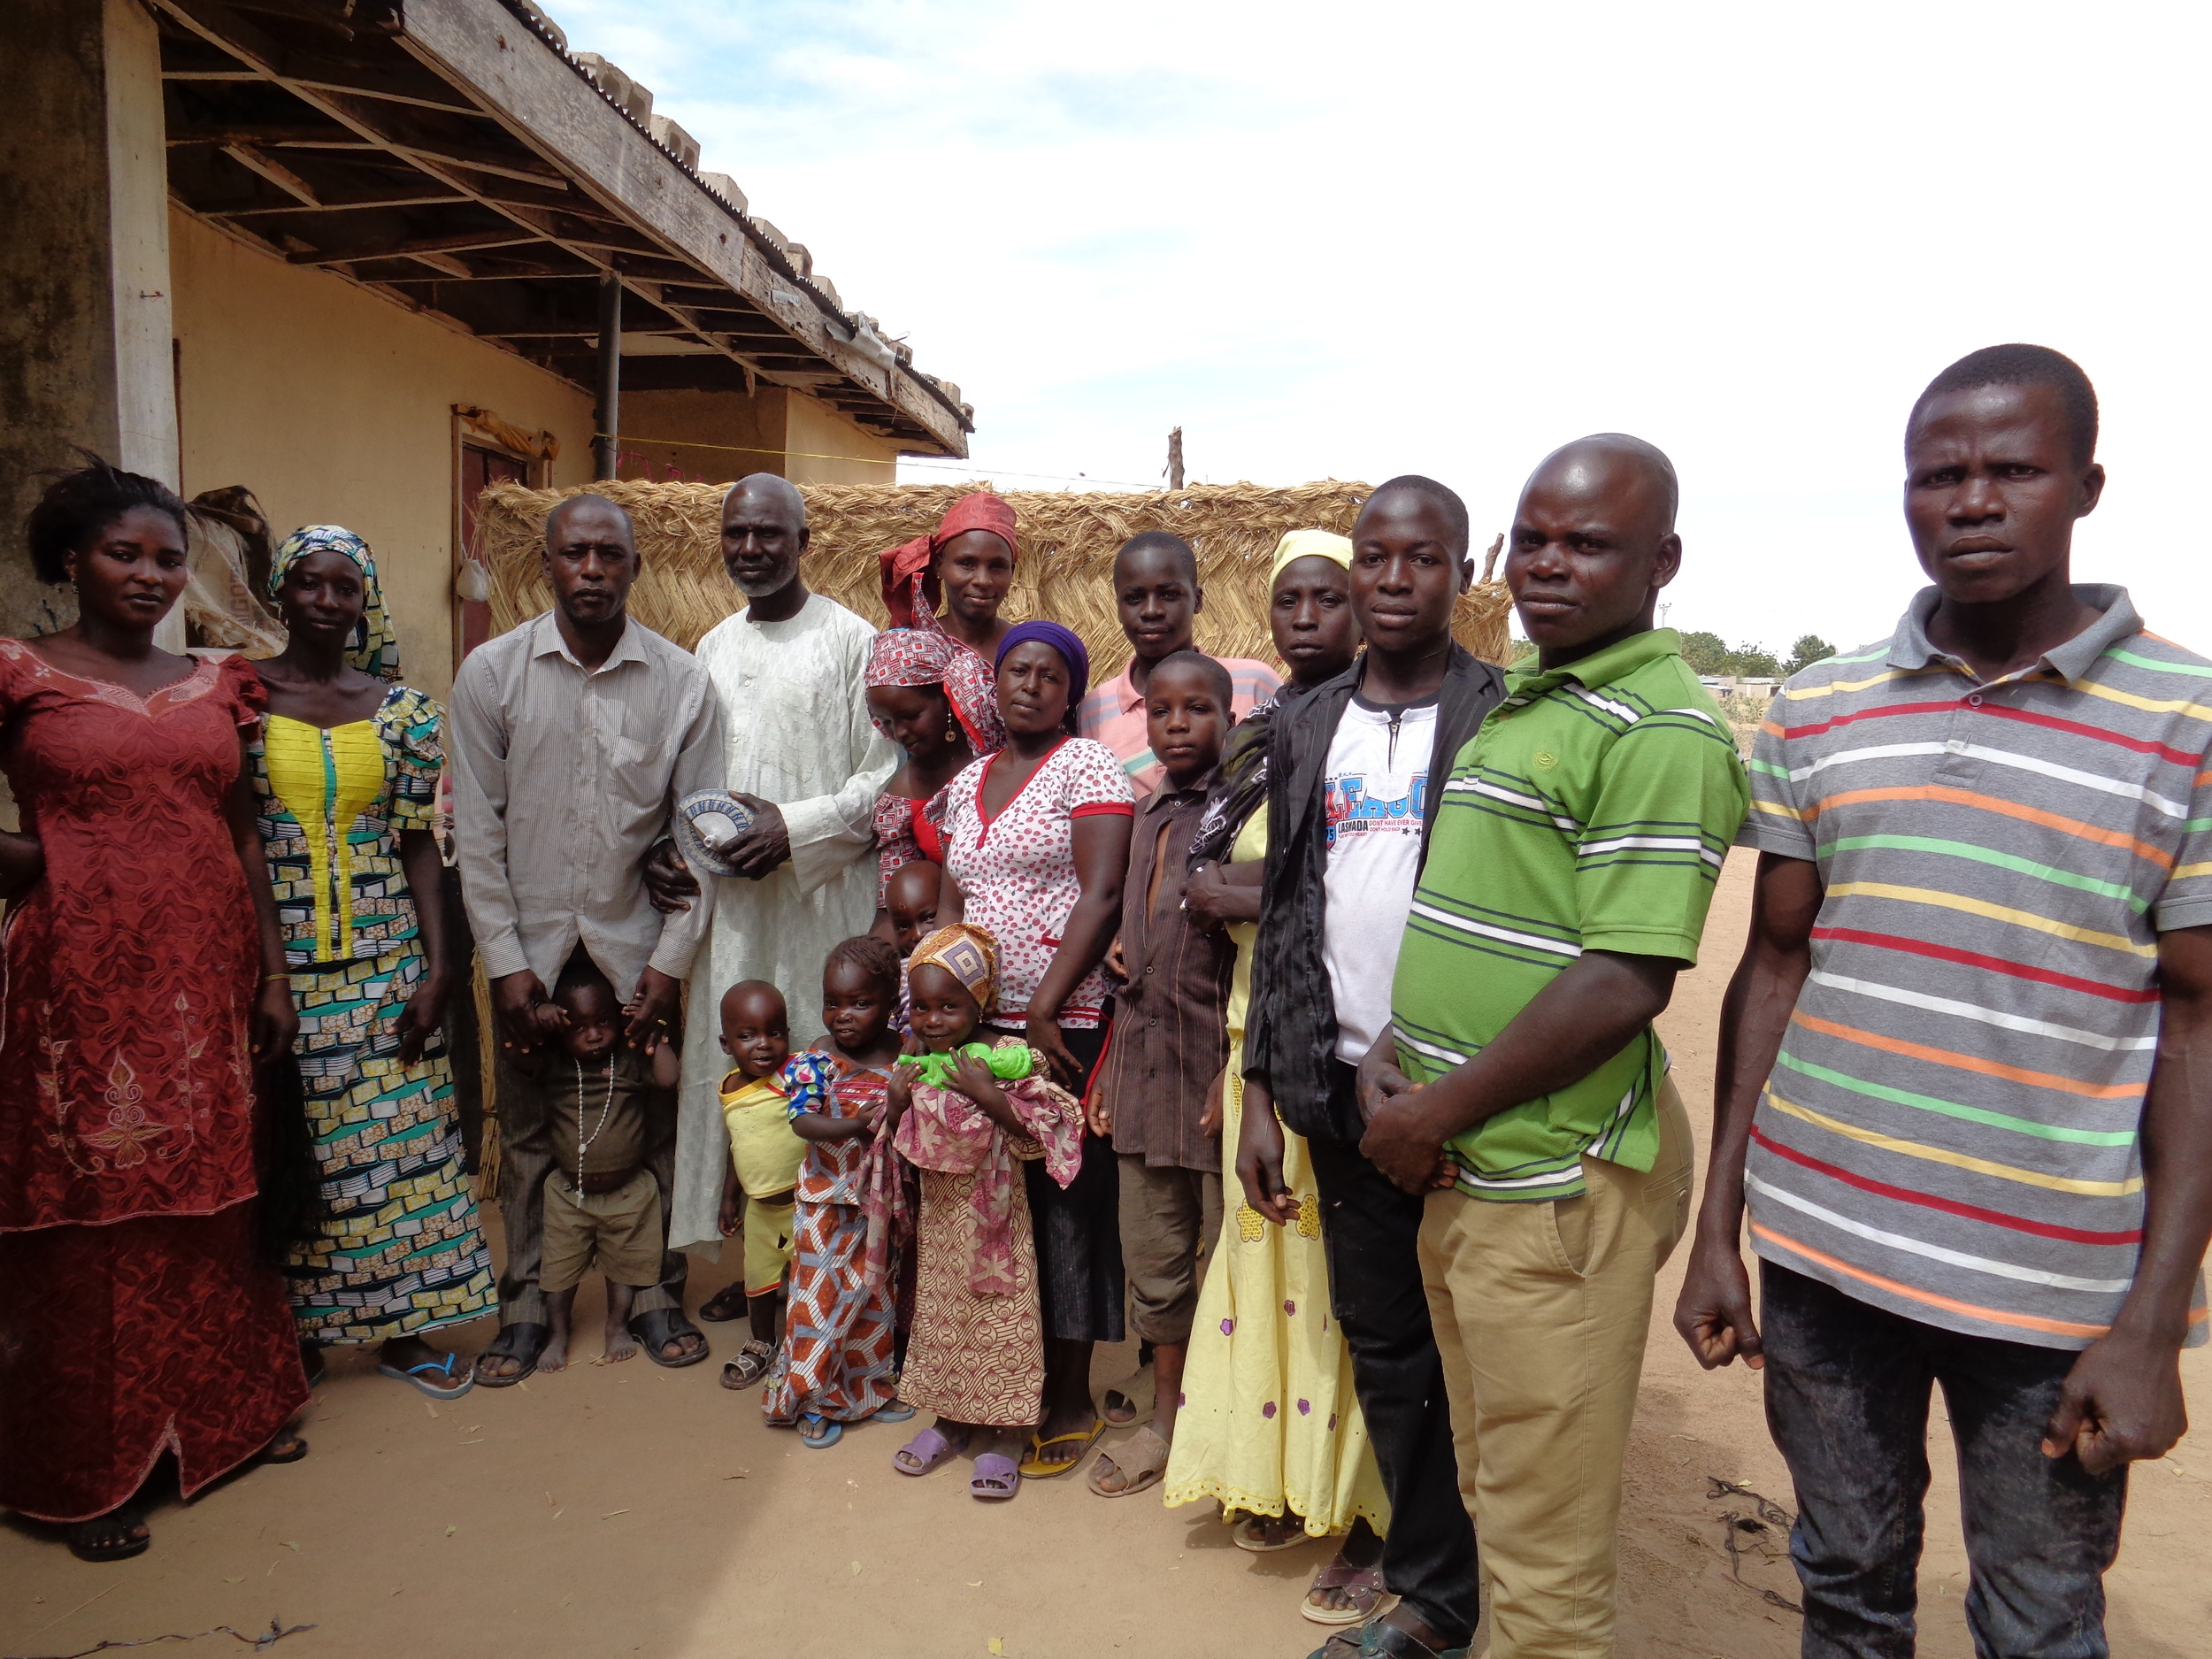 Internally displaced people living in a host community in Maiduguri, northeast Nigeria.